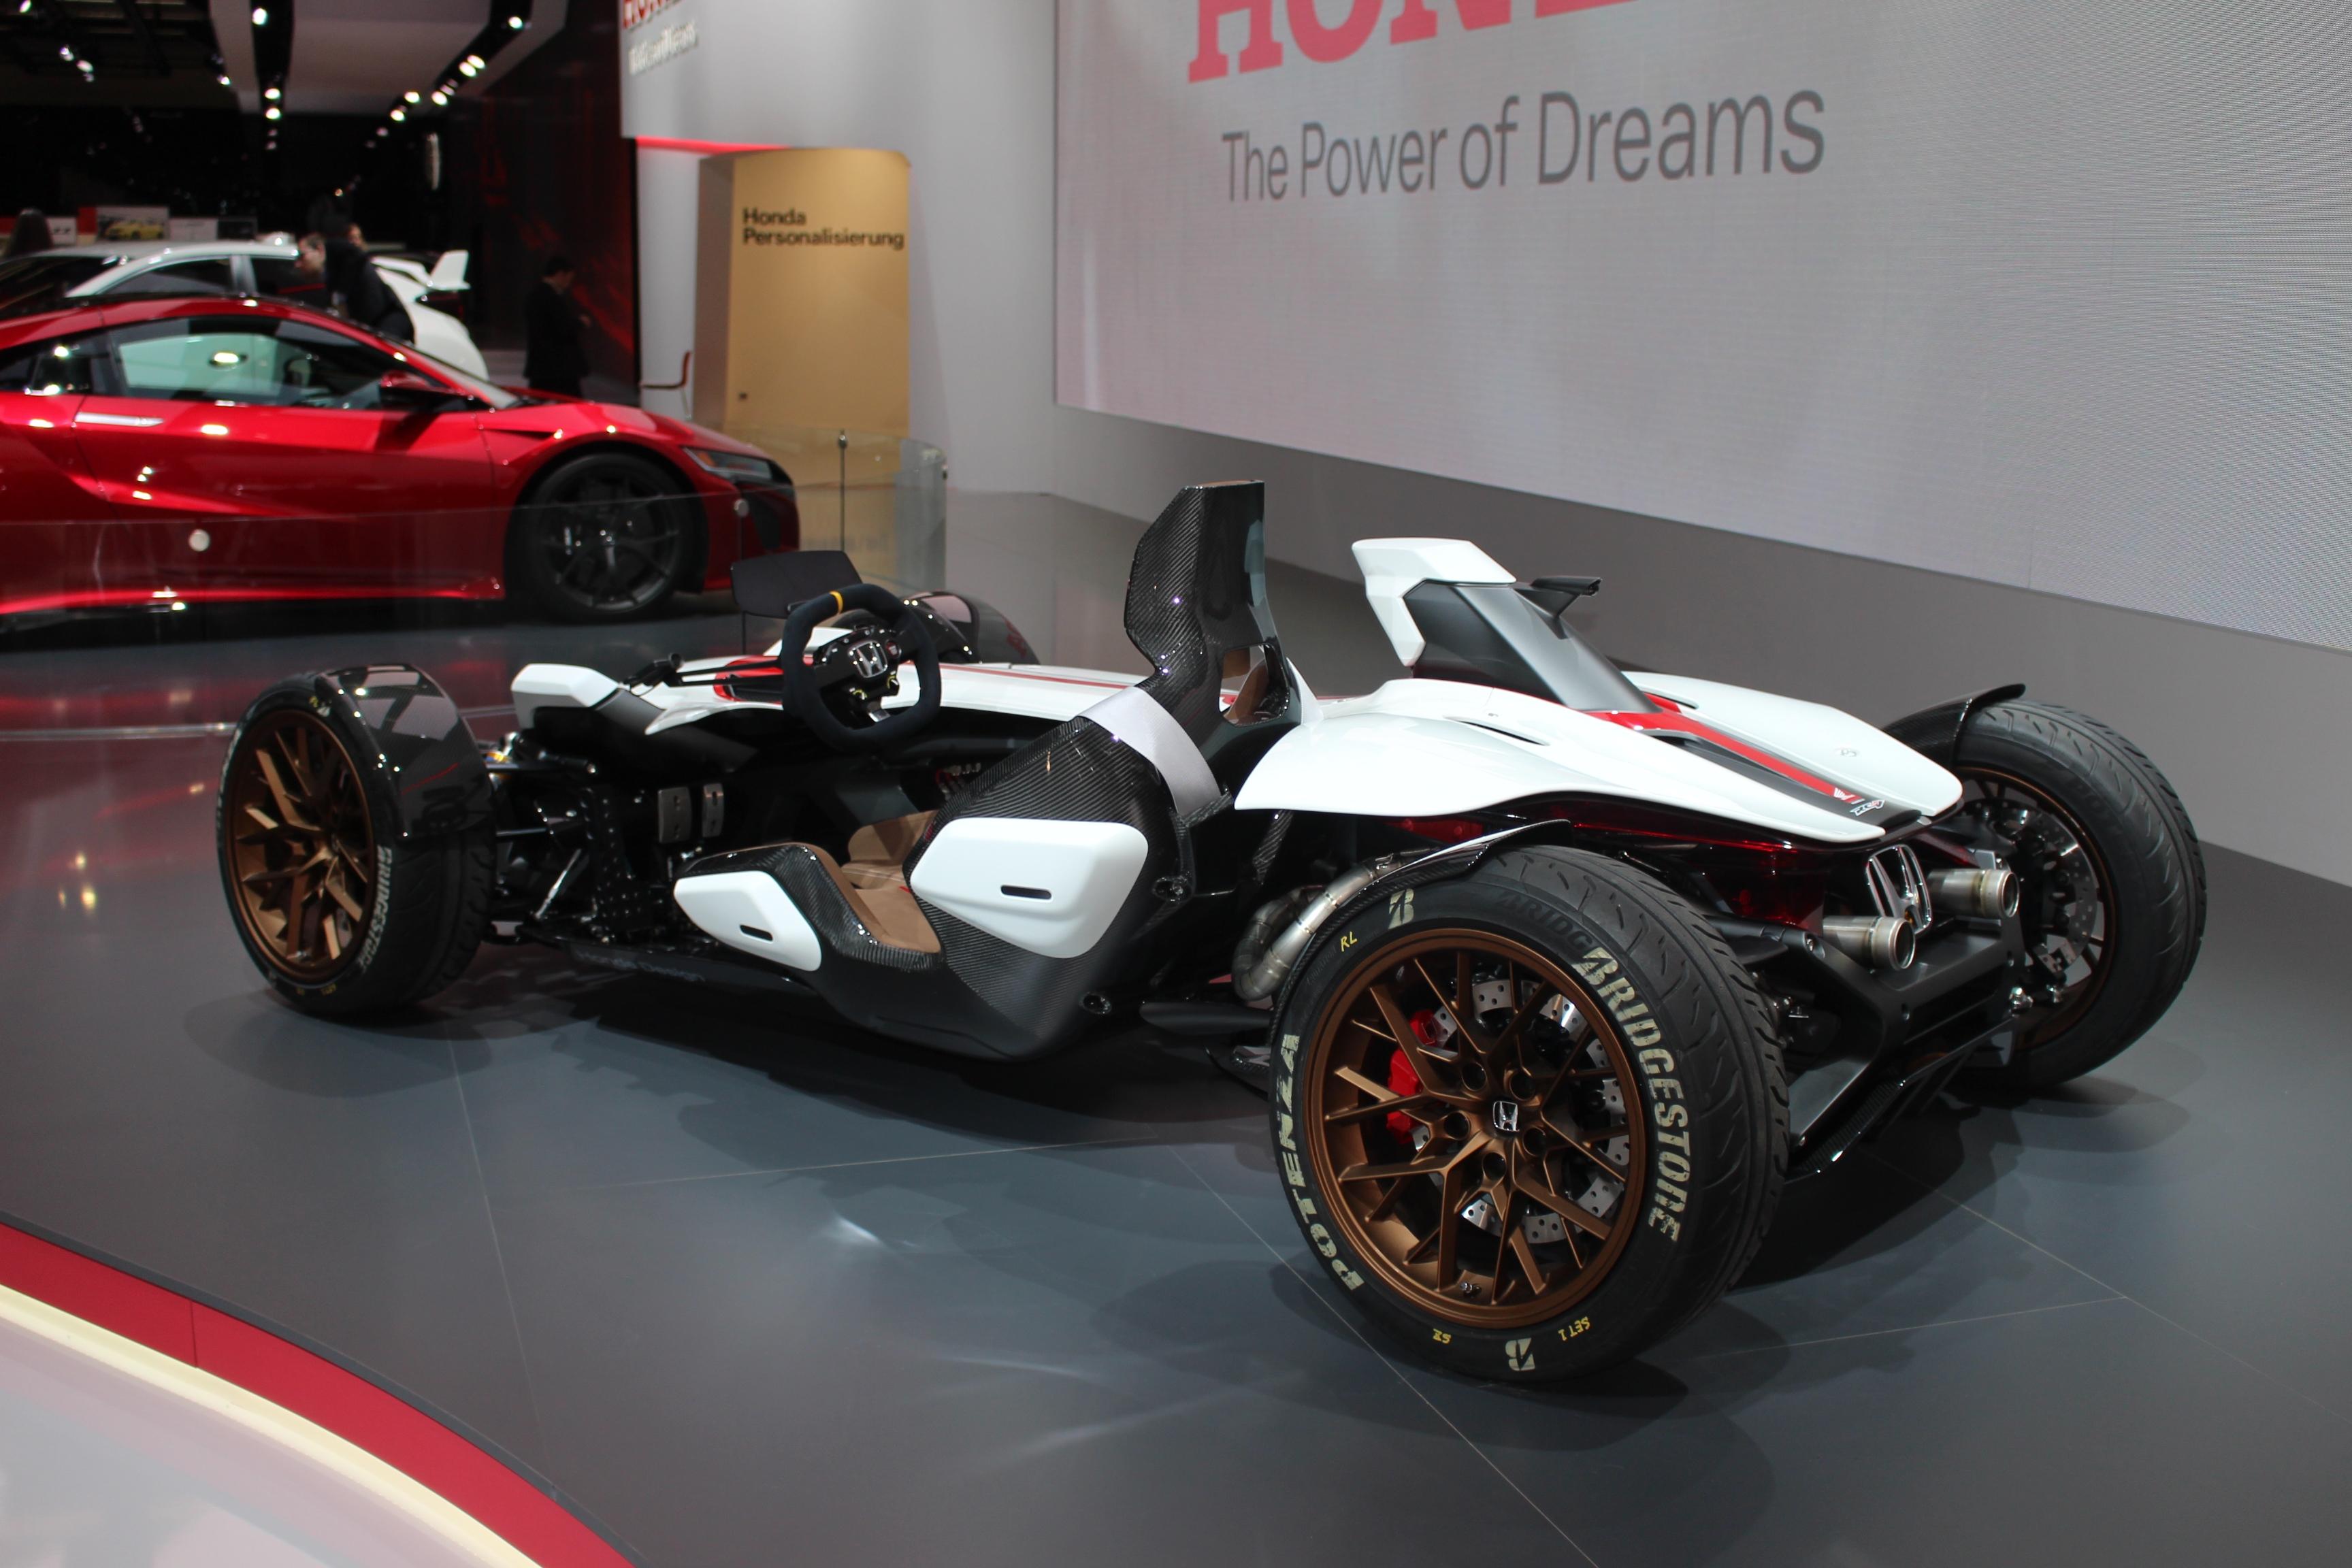 [Image: S0-Honda-2-4-concept-l-excitante-En-dire...362205.jpg]